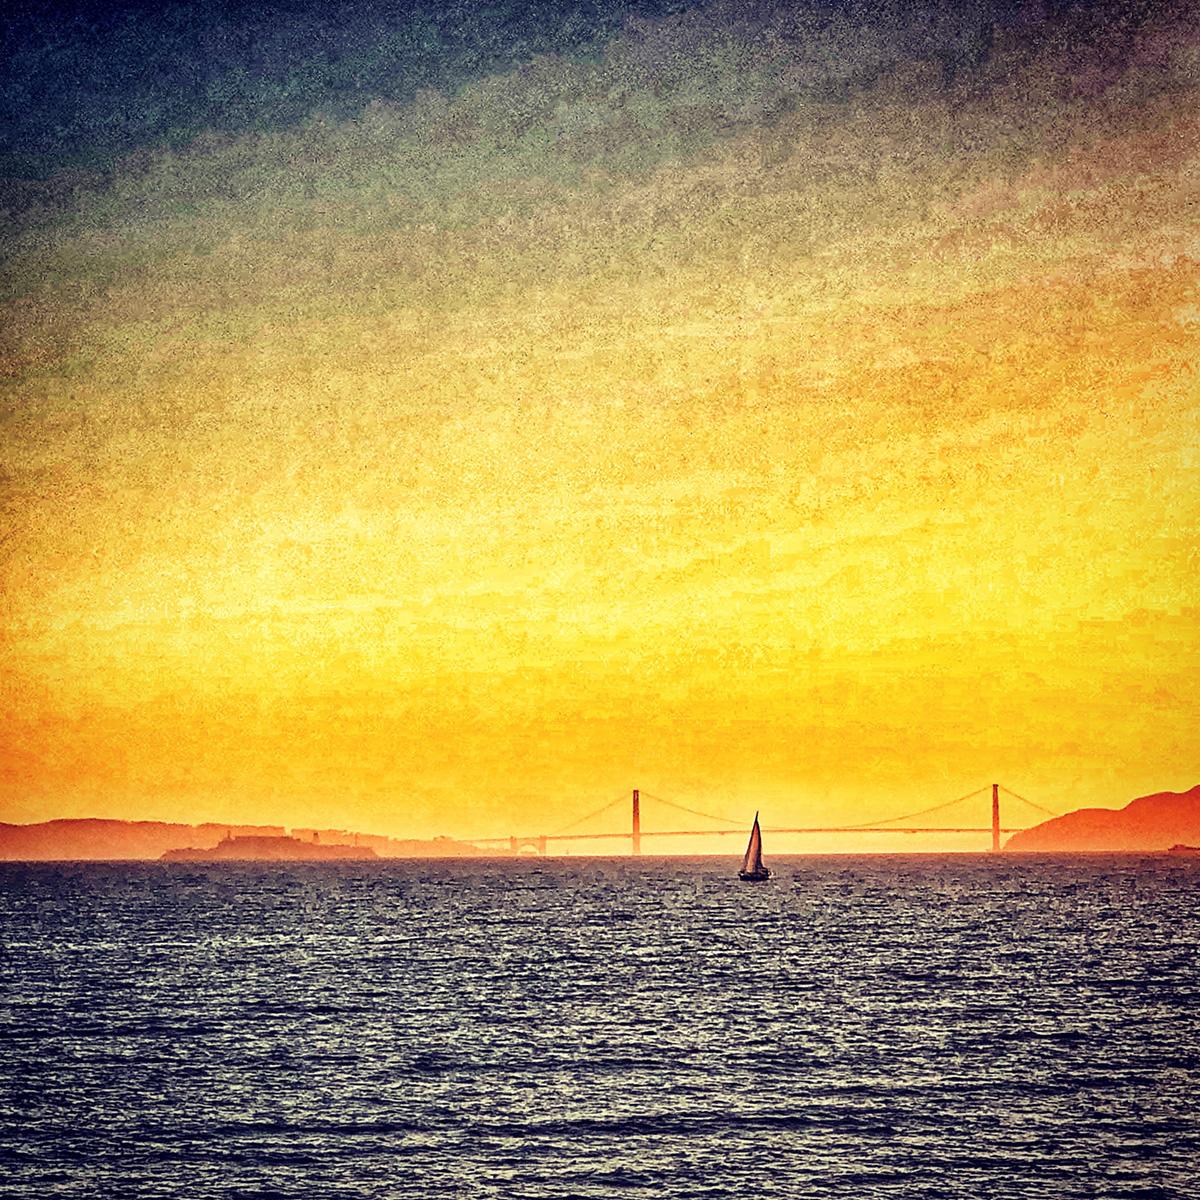 Sailing in Golden Light